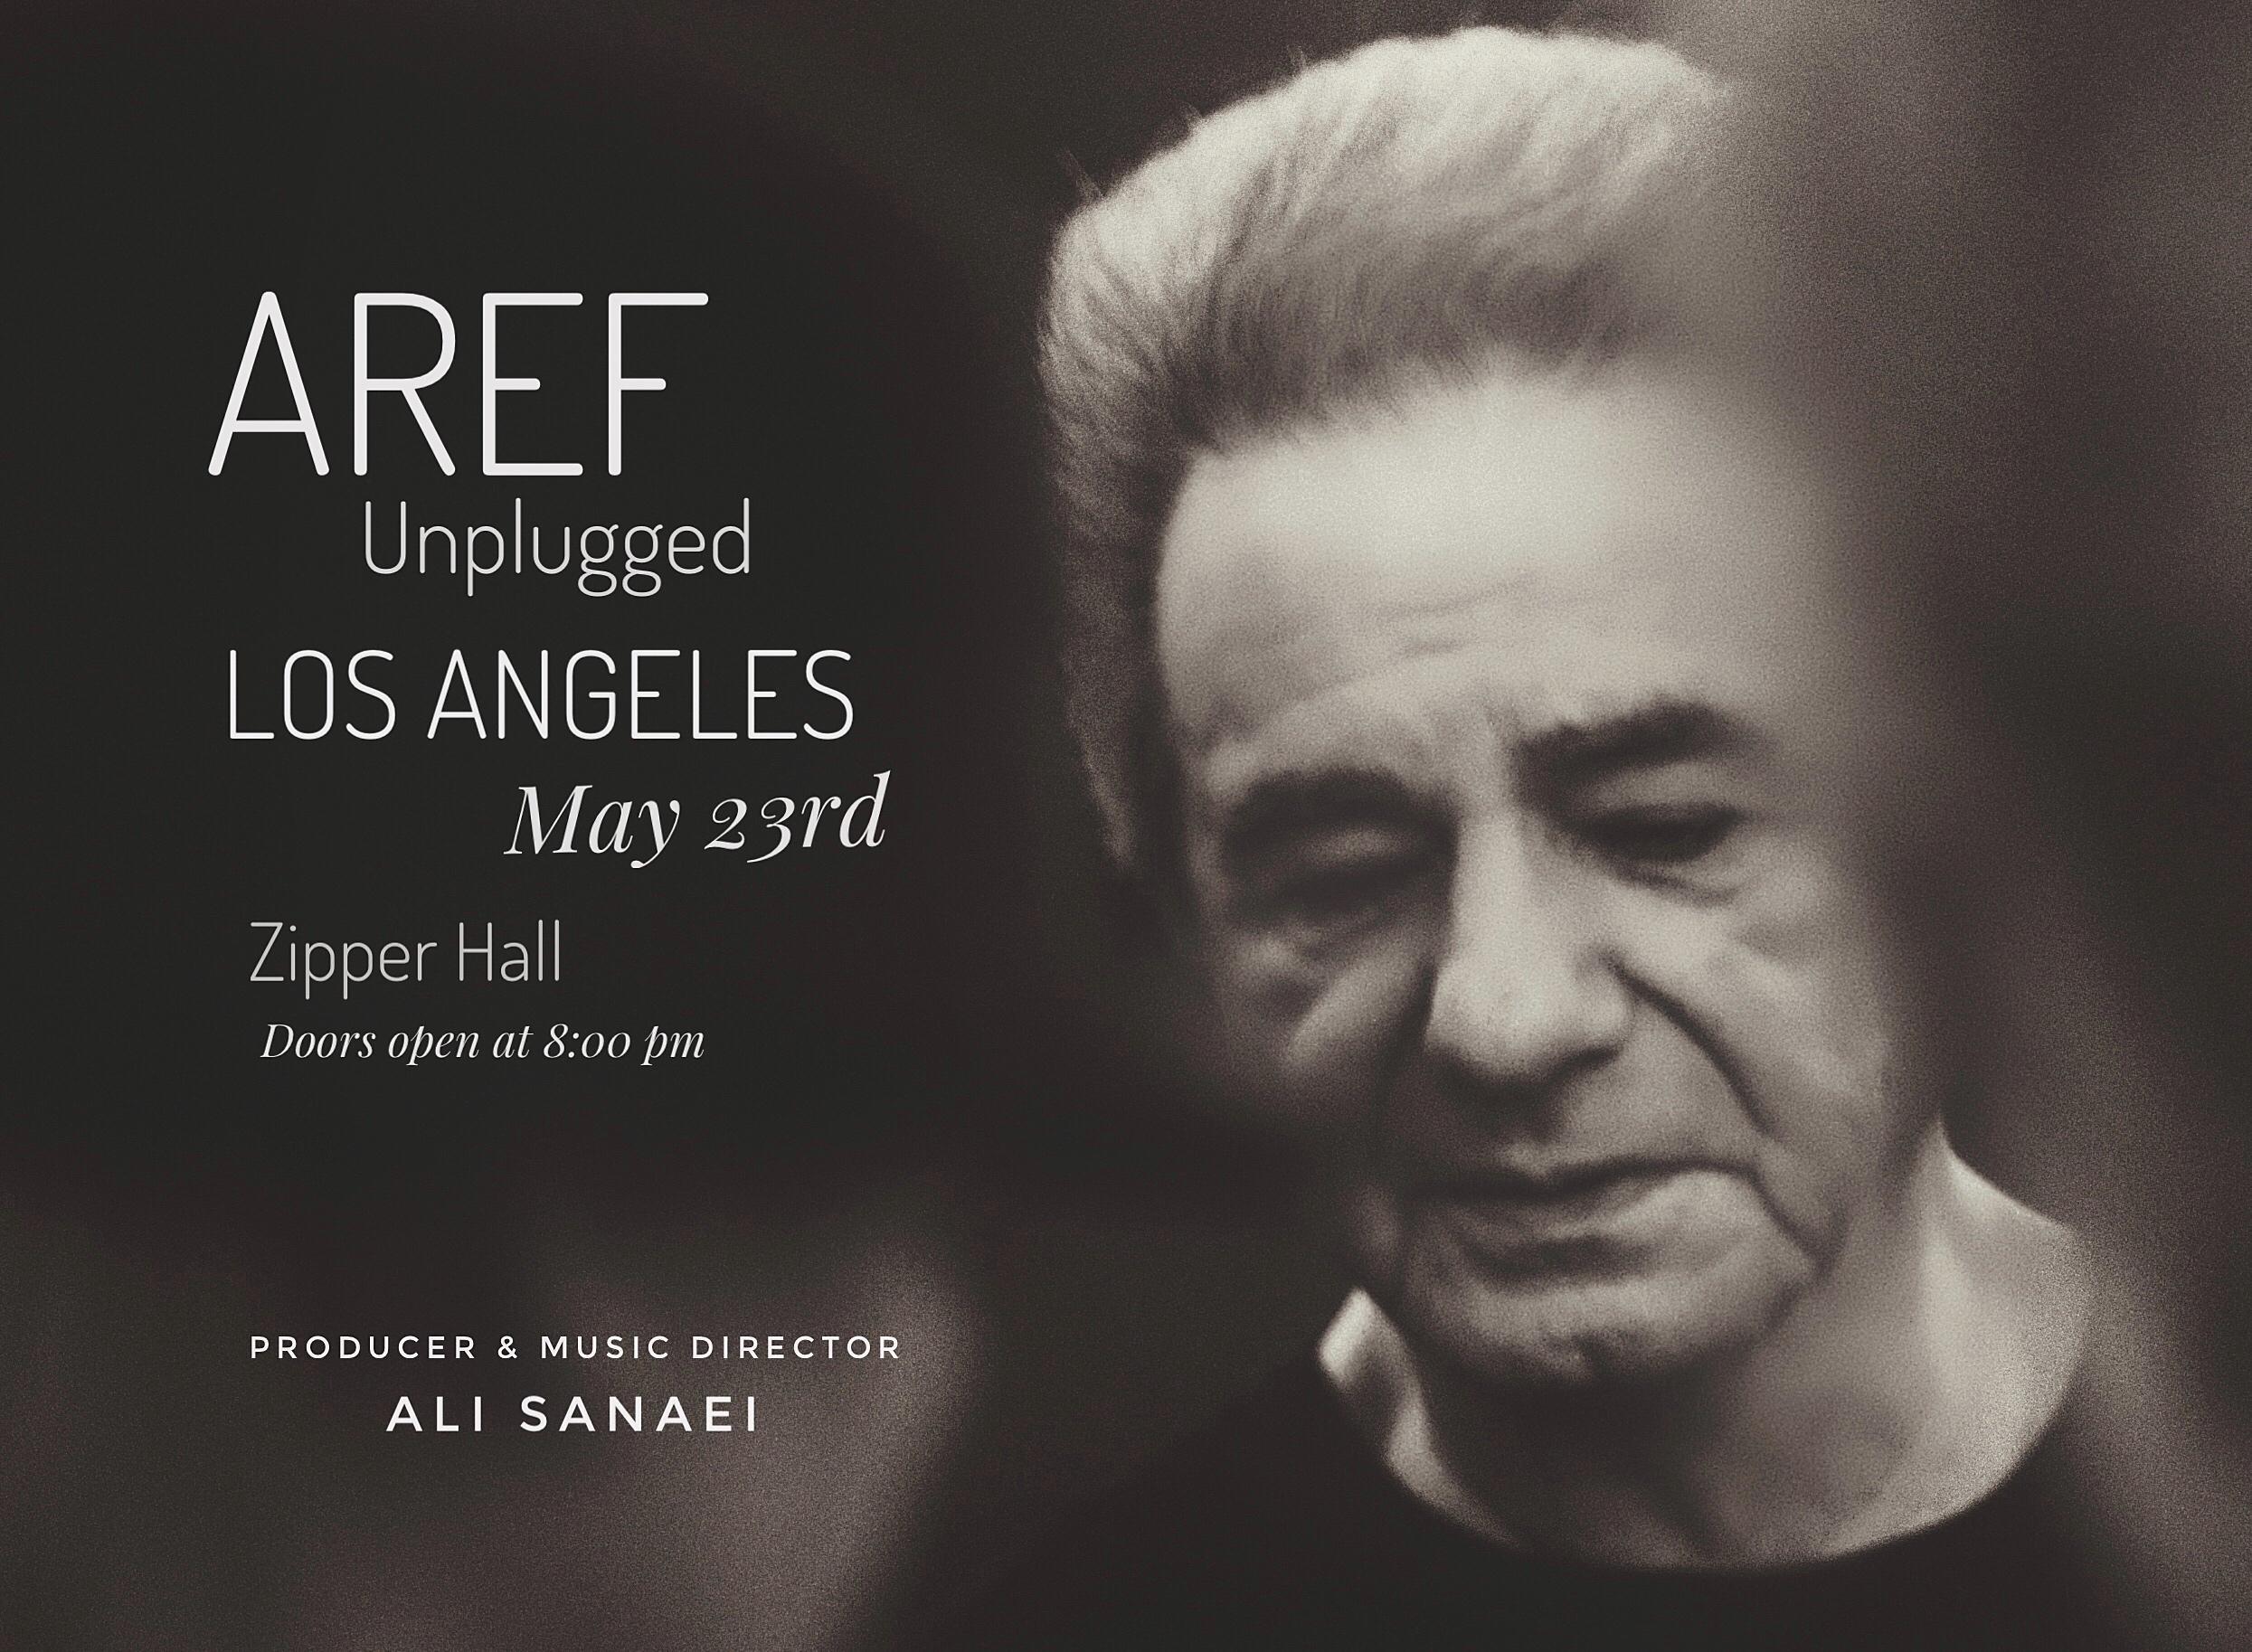 Aref Unplogged - Los Angeles